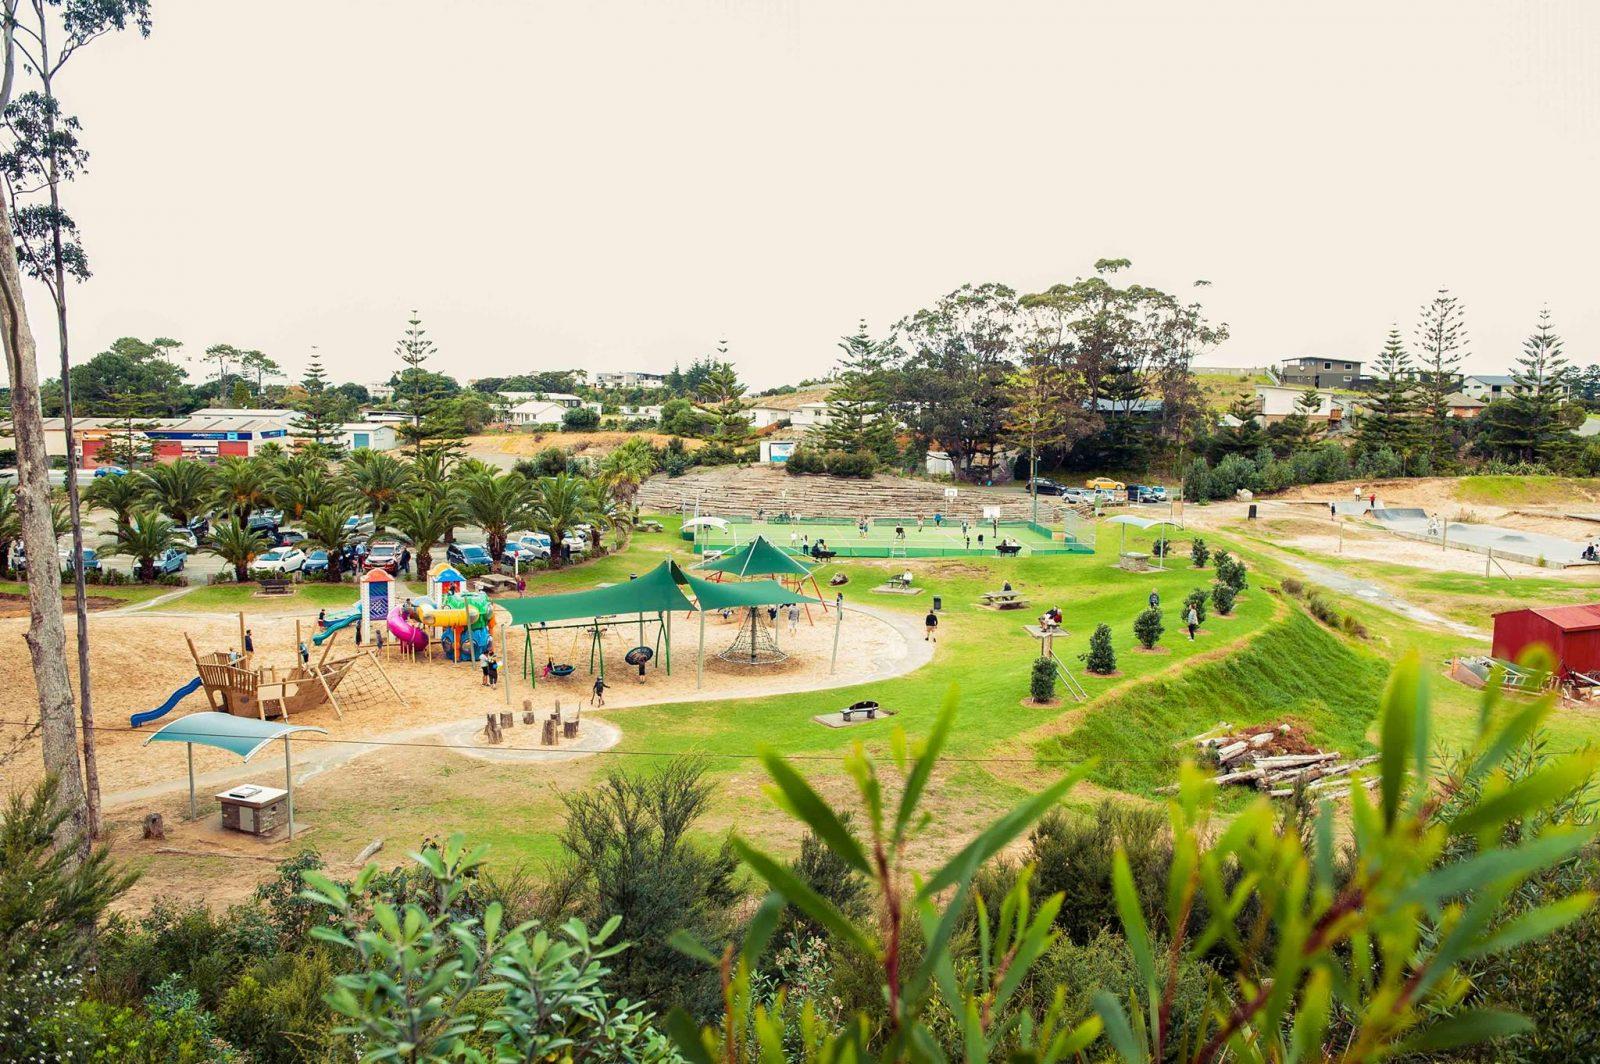 Things To Do In Mangawhai - Mangawhai Activity Zone